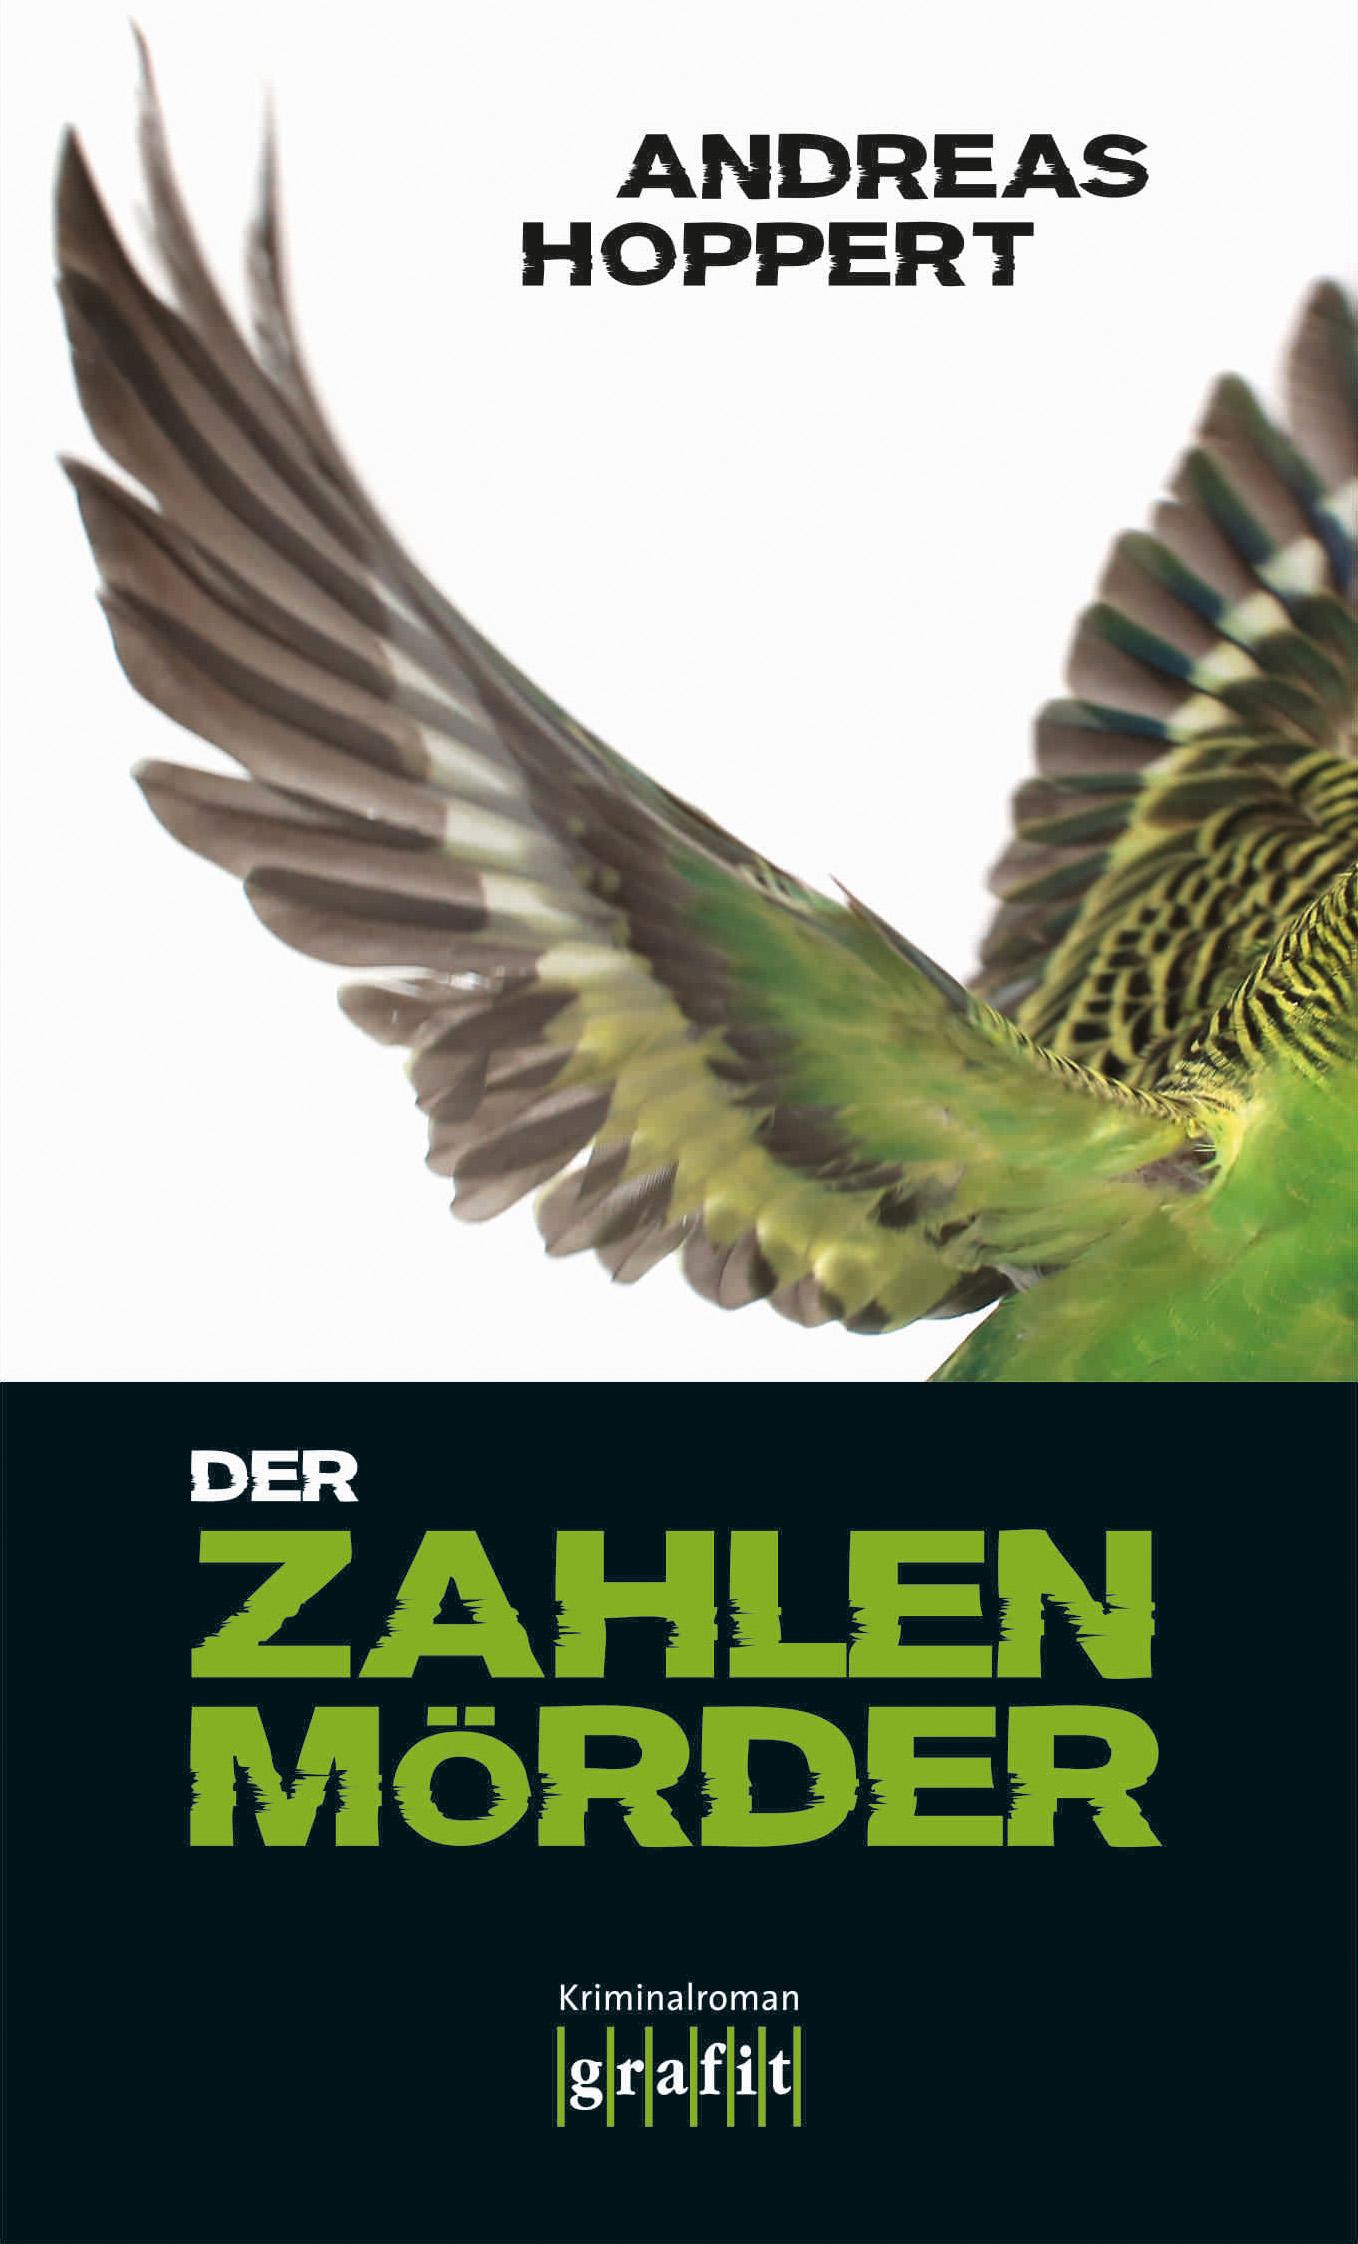 Der Zahlenmörder - Andreas Hoppert